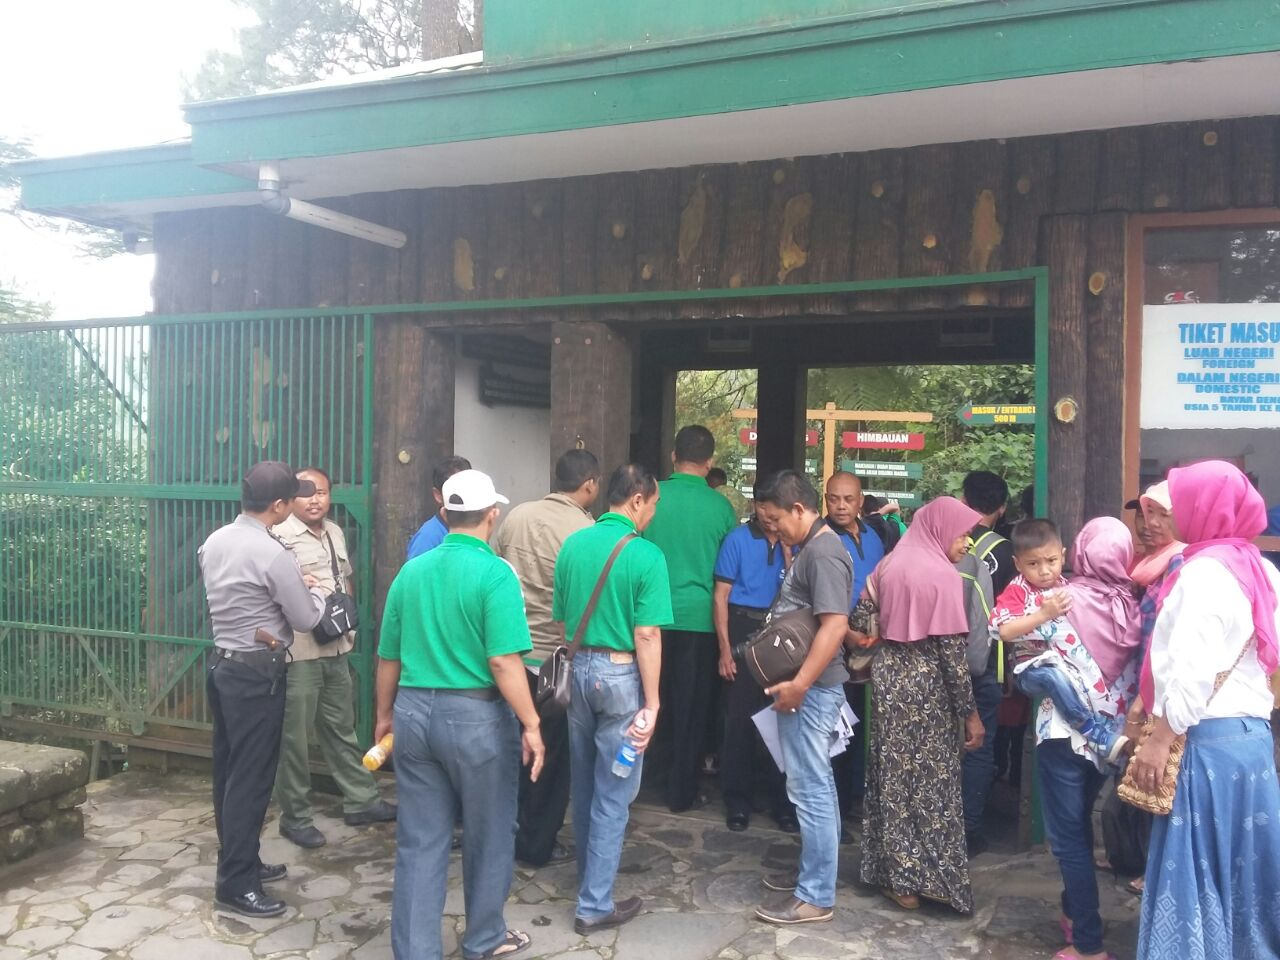 Polsek Tawangmangu Intensifkan Patroli Di Sejumlah Objek